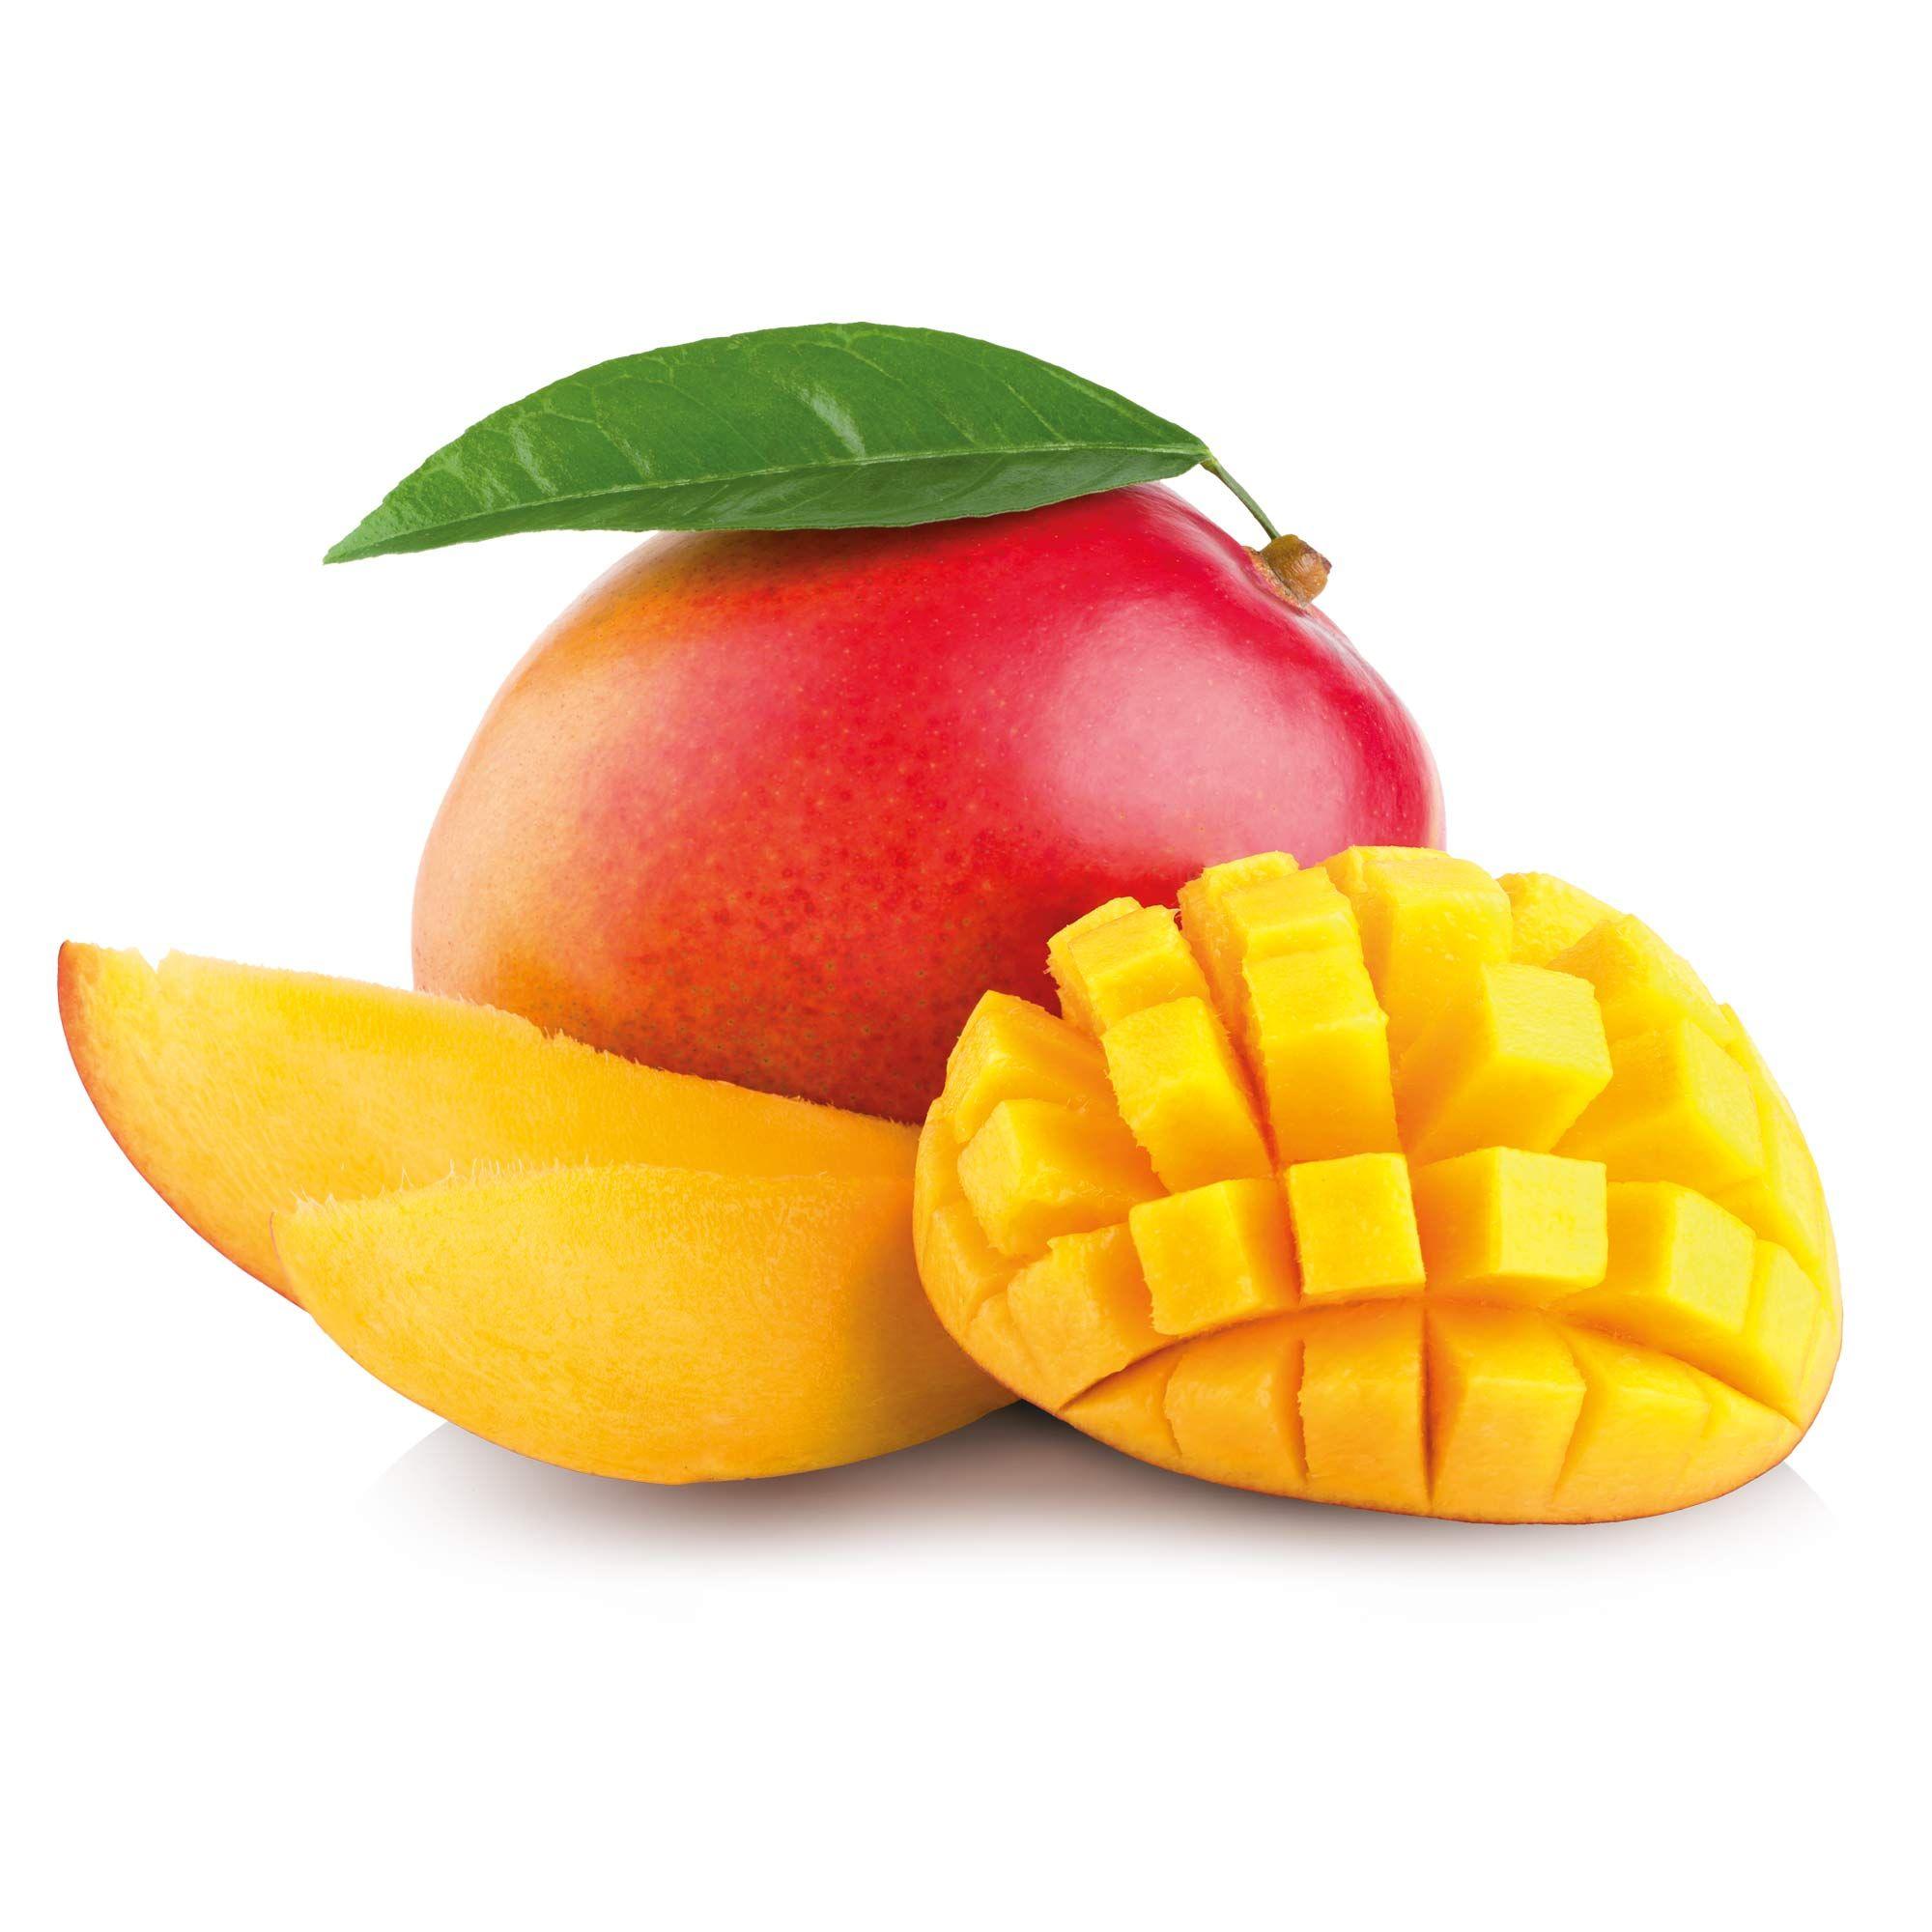 Mango das Stück für 0,69€ [Penny ab 02.03]